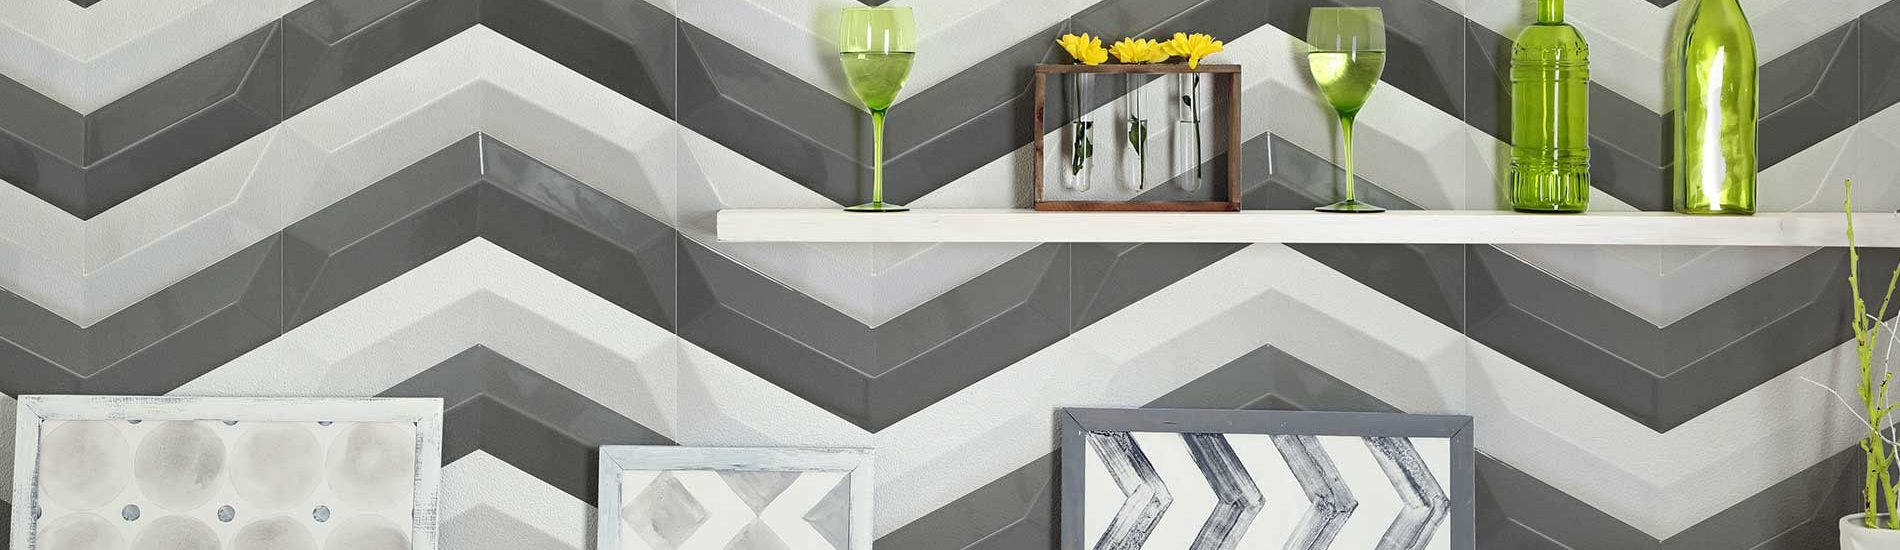 banner-chevron-spanish-3D-look-deco-floor-wall-tile-hrg-heralgi-anaheim-tile-store